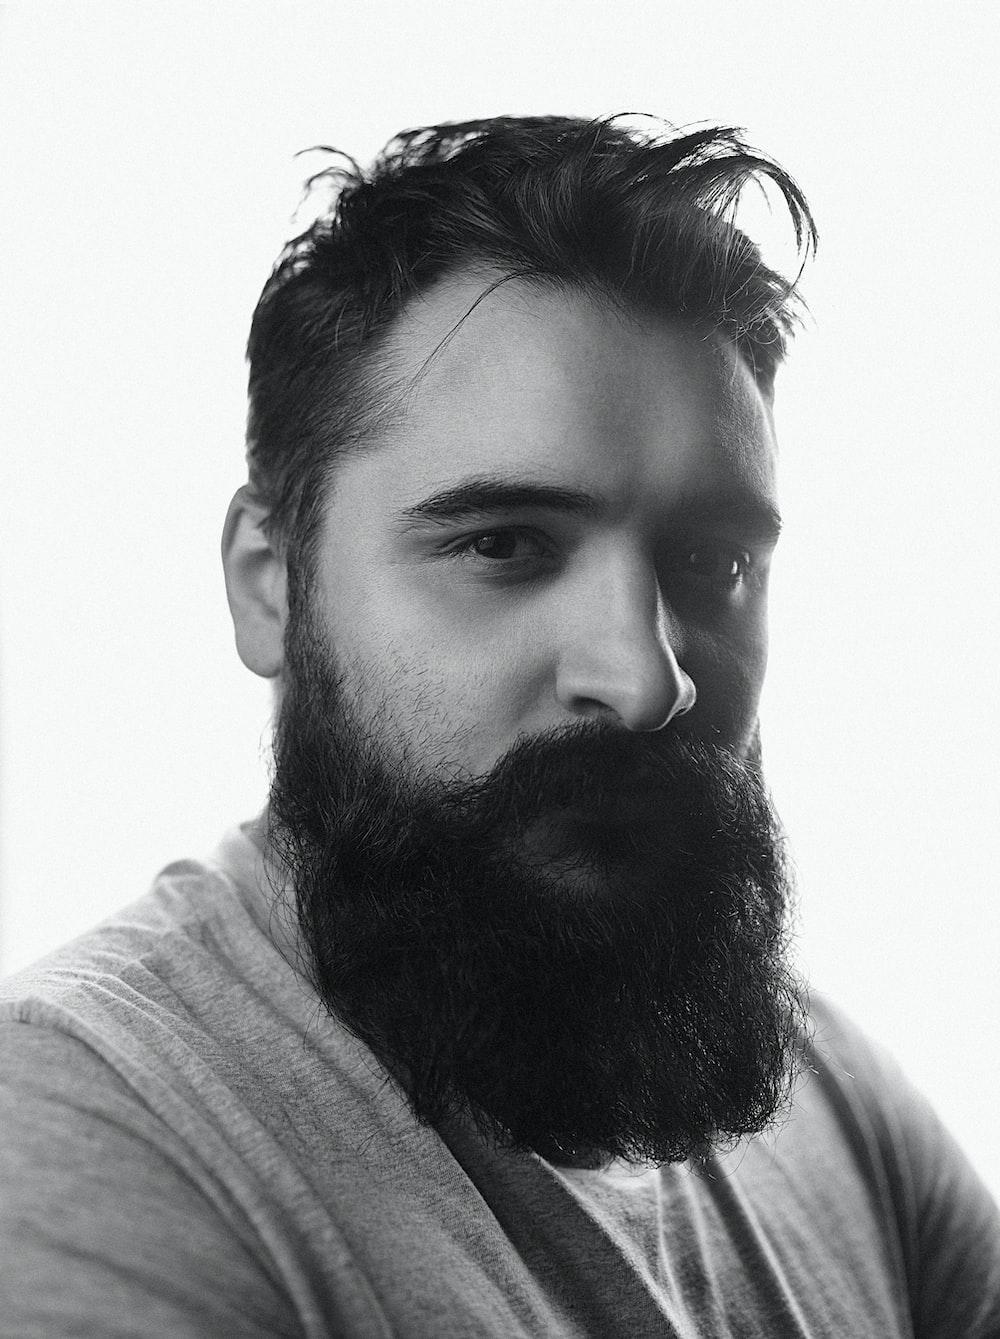 man in gray shirt with black beard